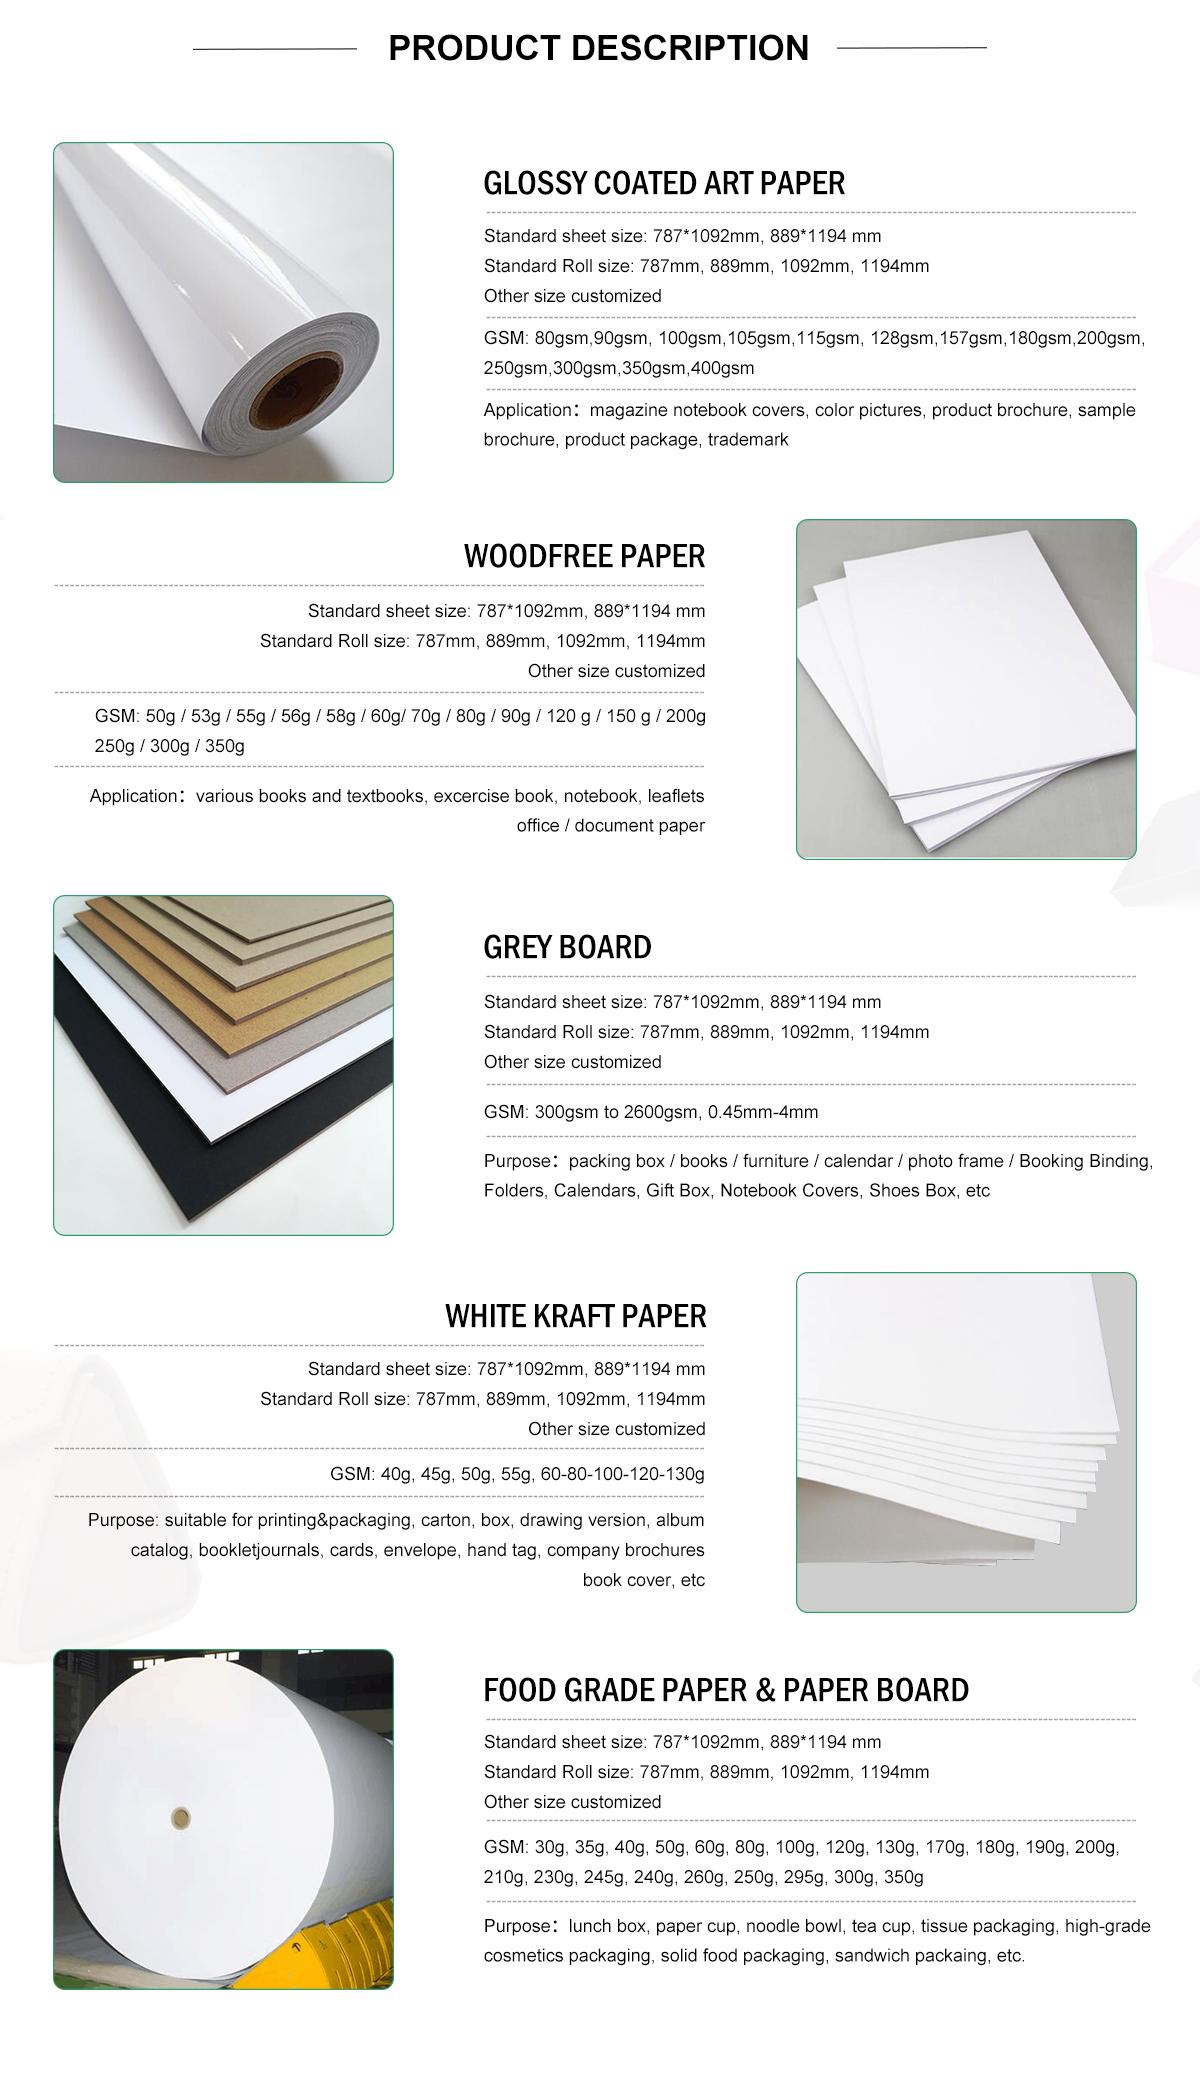 Guangzhou Aper Co Ltd White Bond Paper Offset Printing Kertas Foto E Print Glossy Alumunium Pack 200gsm Why Choose Us